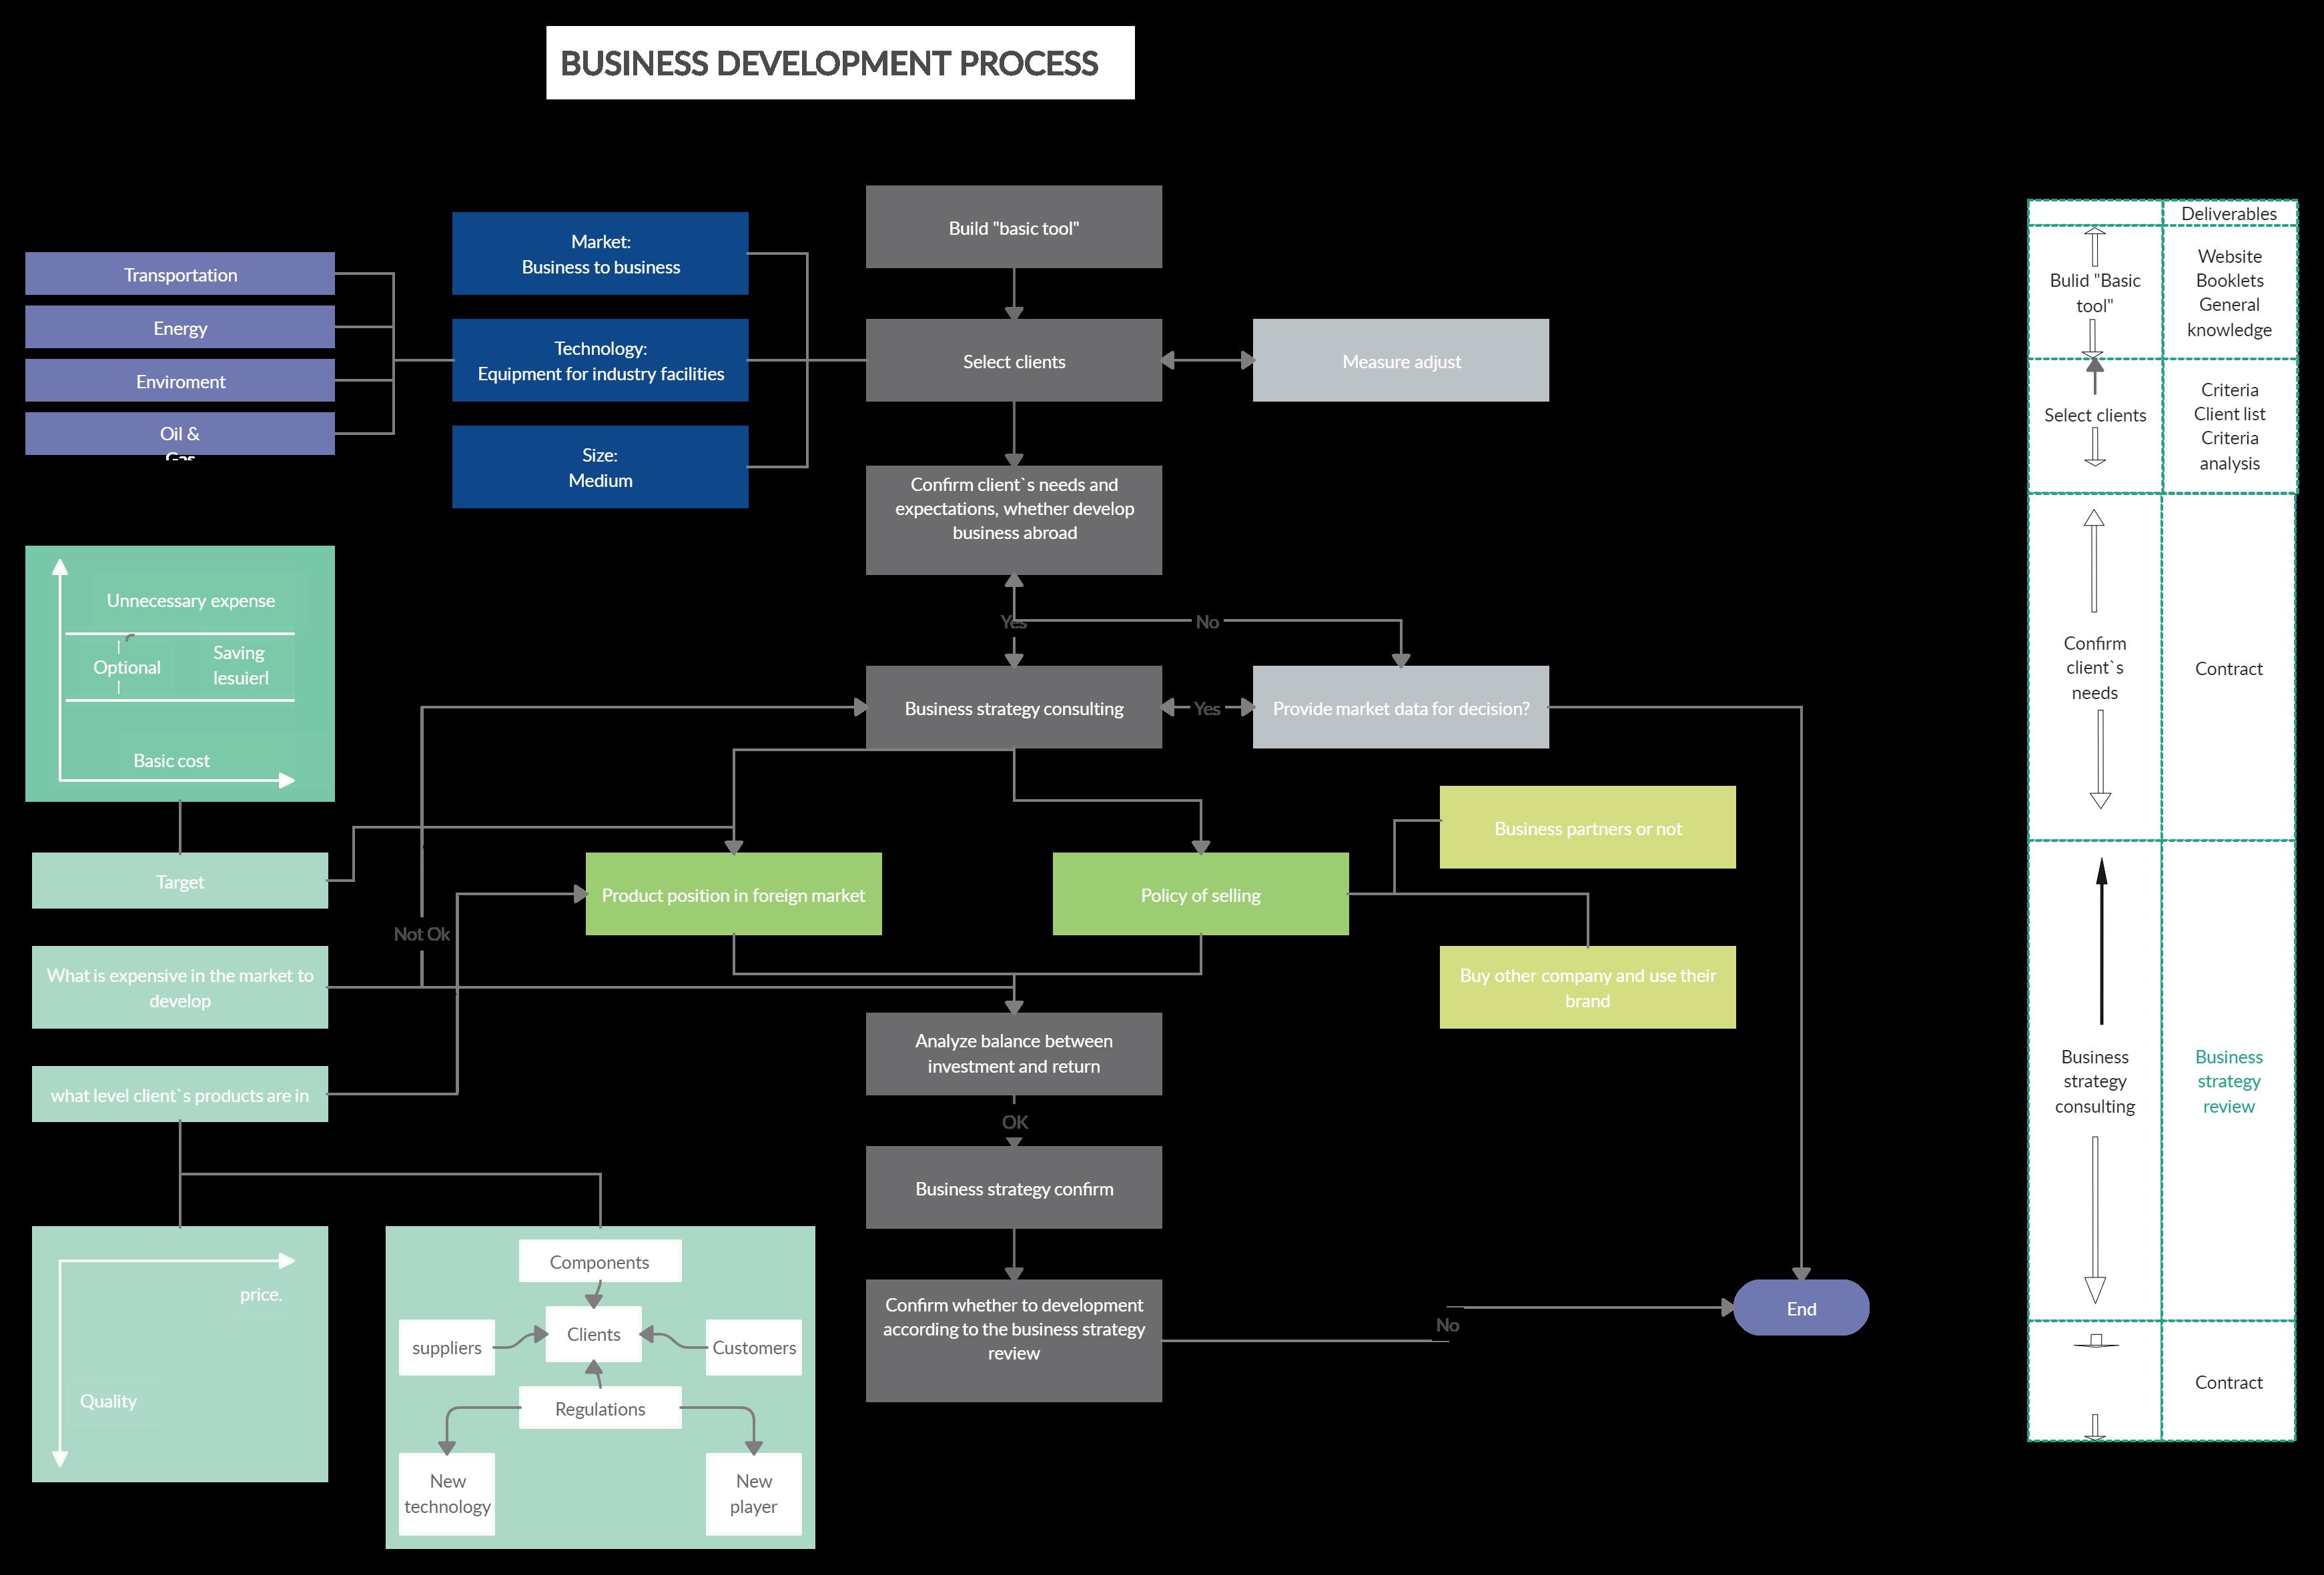 [SCHEMATICS_4UK]  Business Development Process   Process flow, Business development, Flow  chart   Process Flow Diagram For Images Development      Pinterest